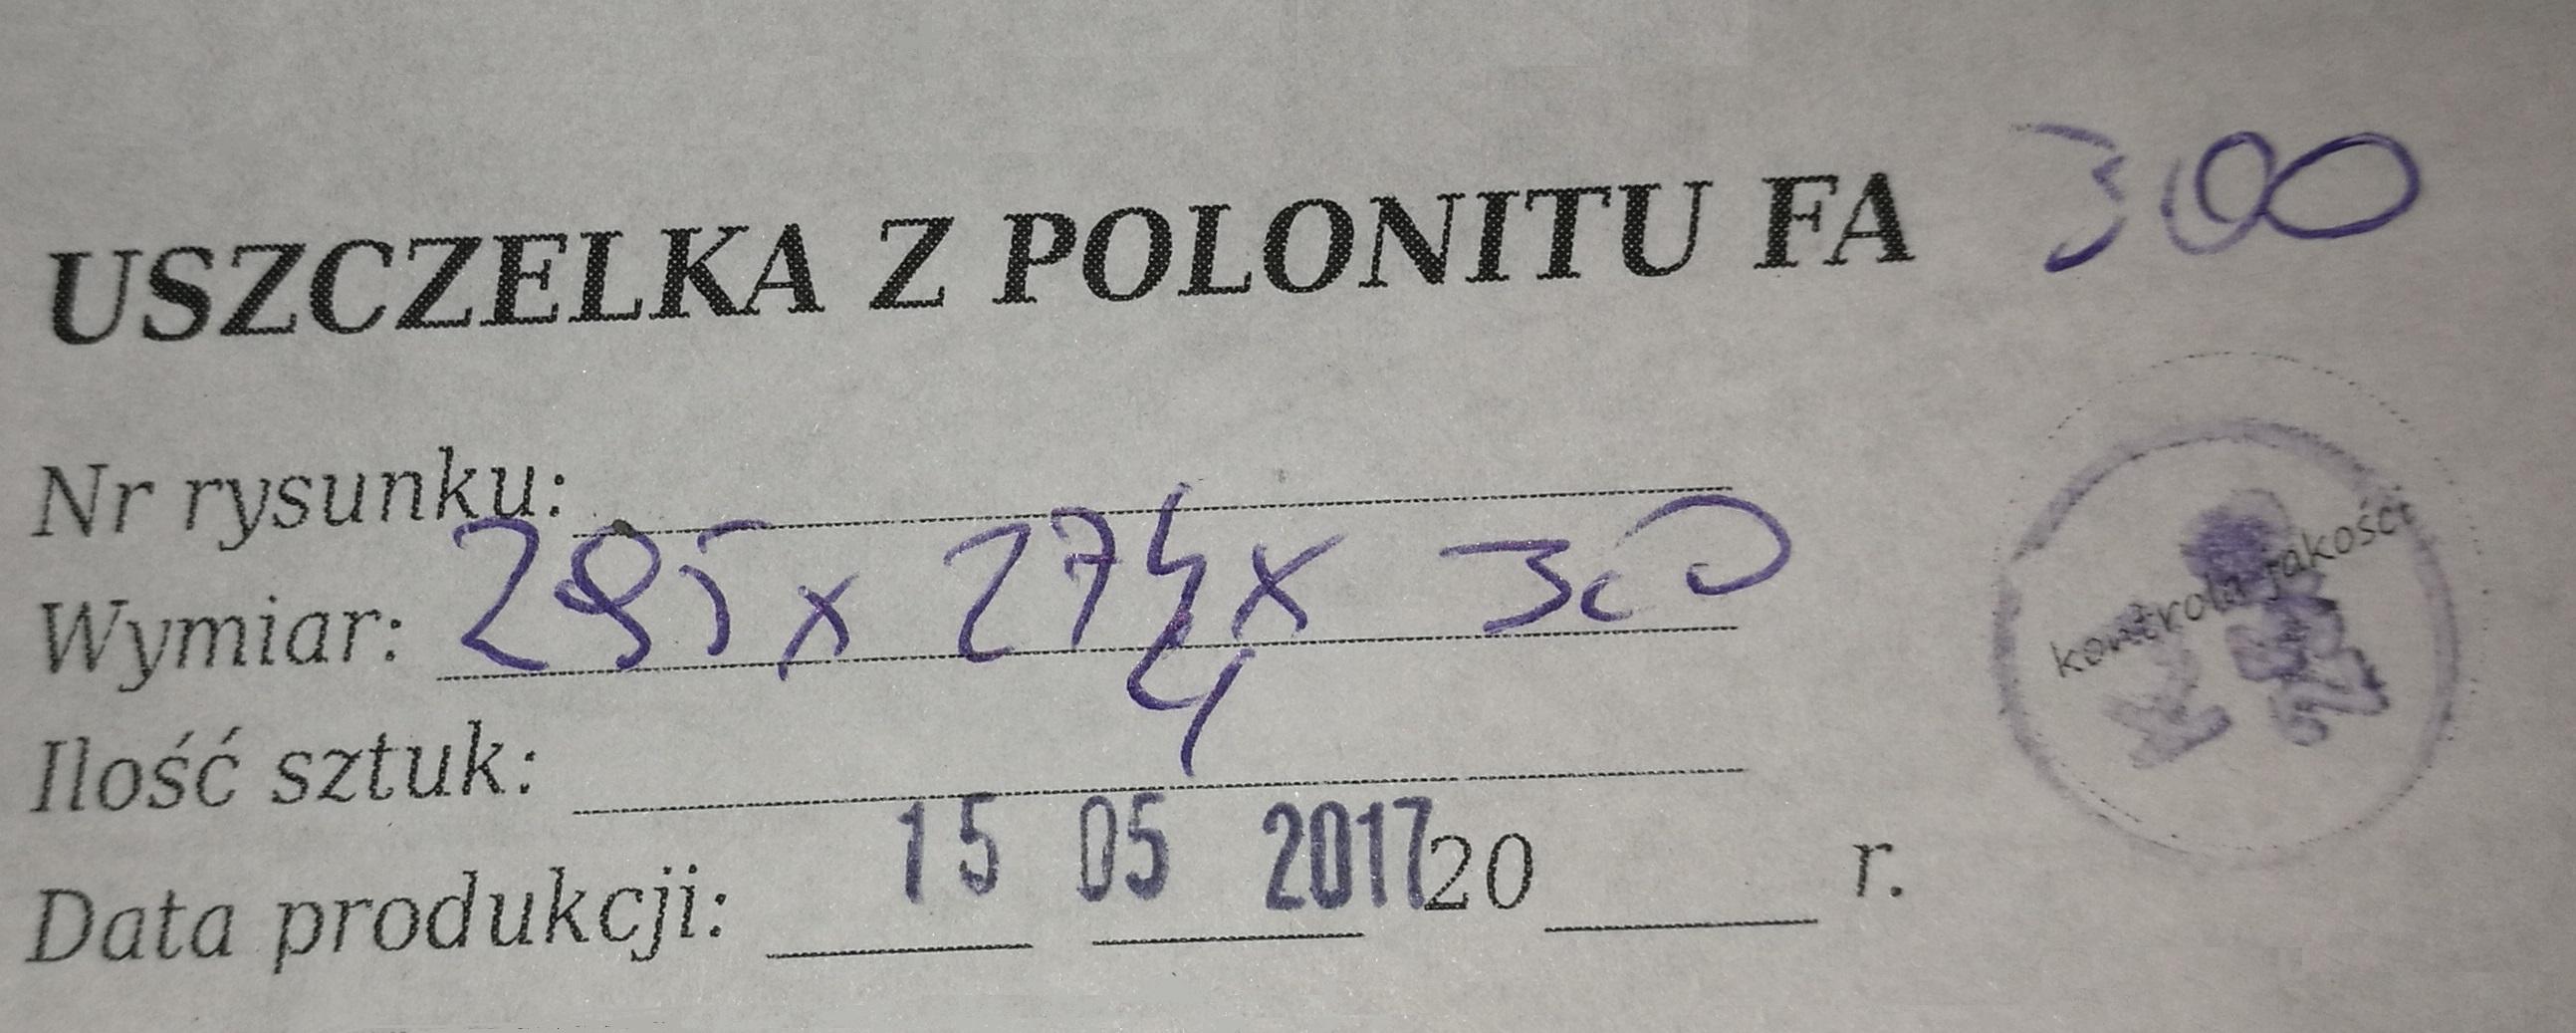 Uszczelka WP 6/16-3/2 - etykieta